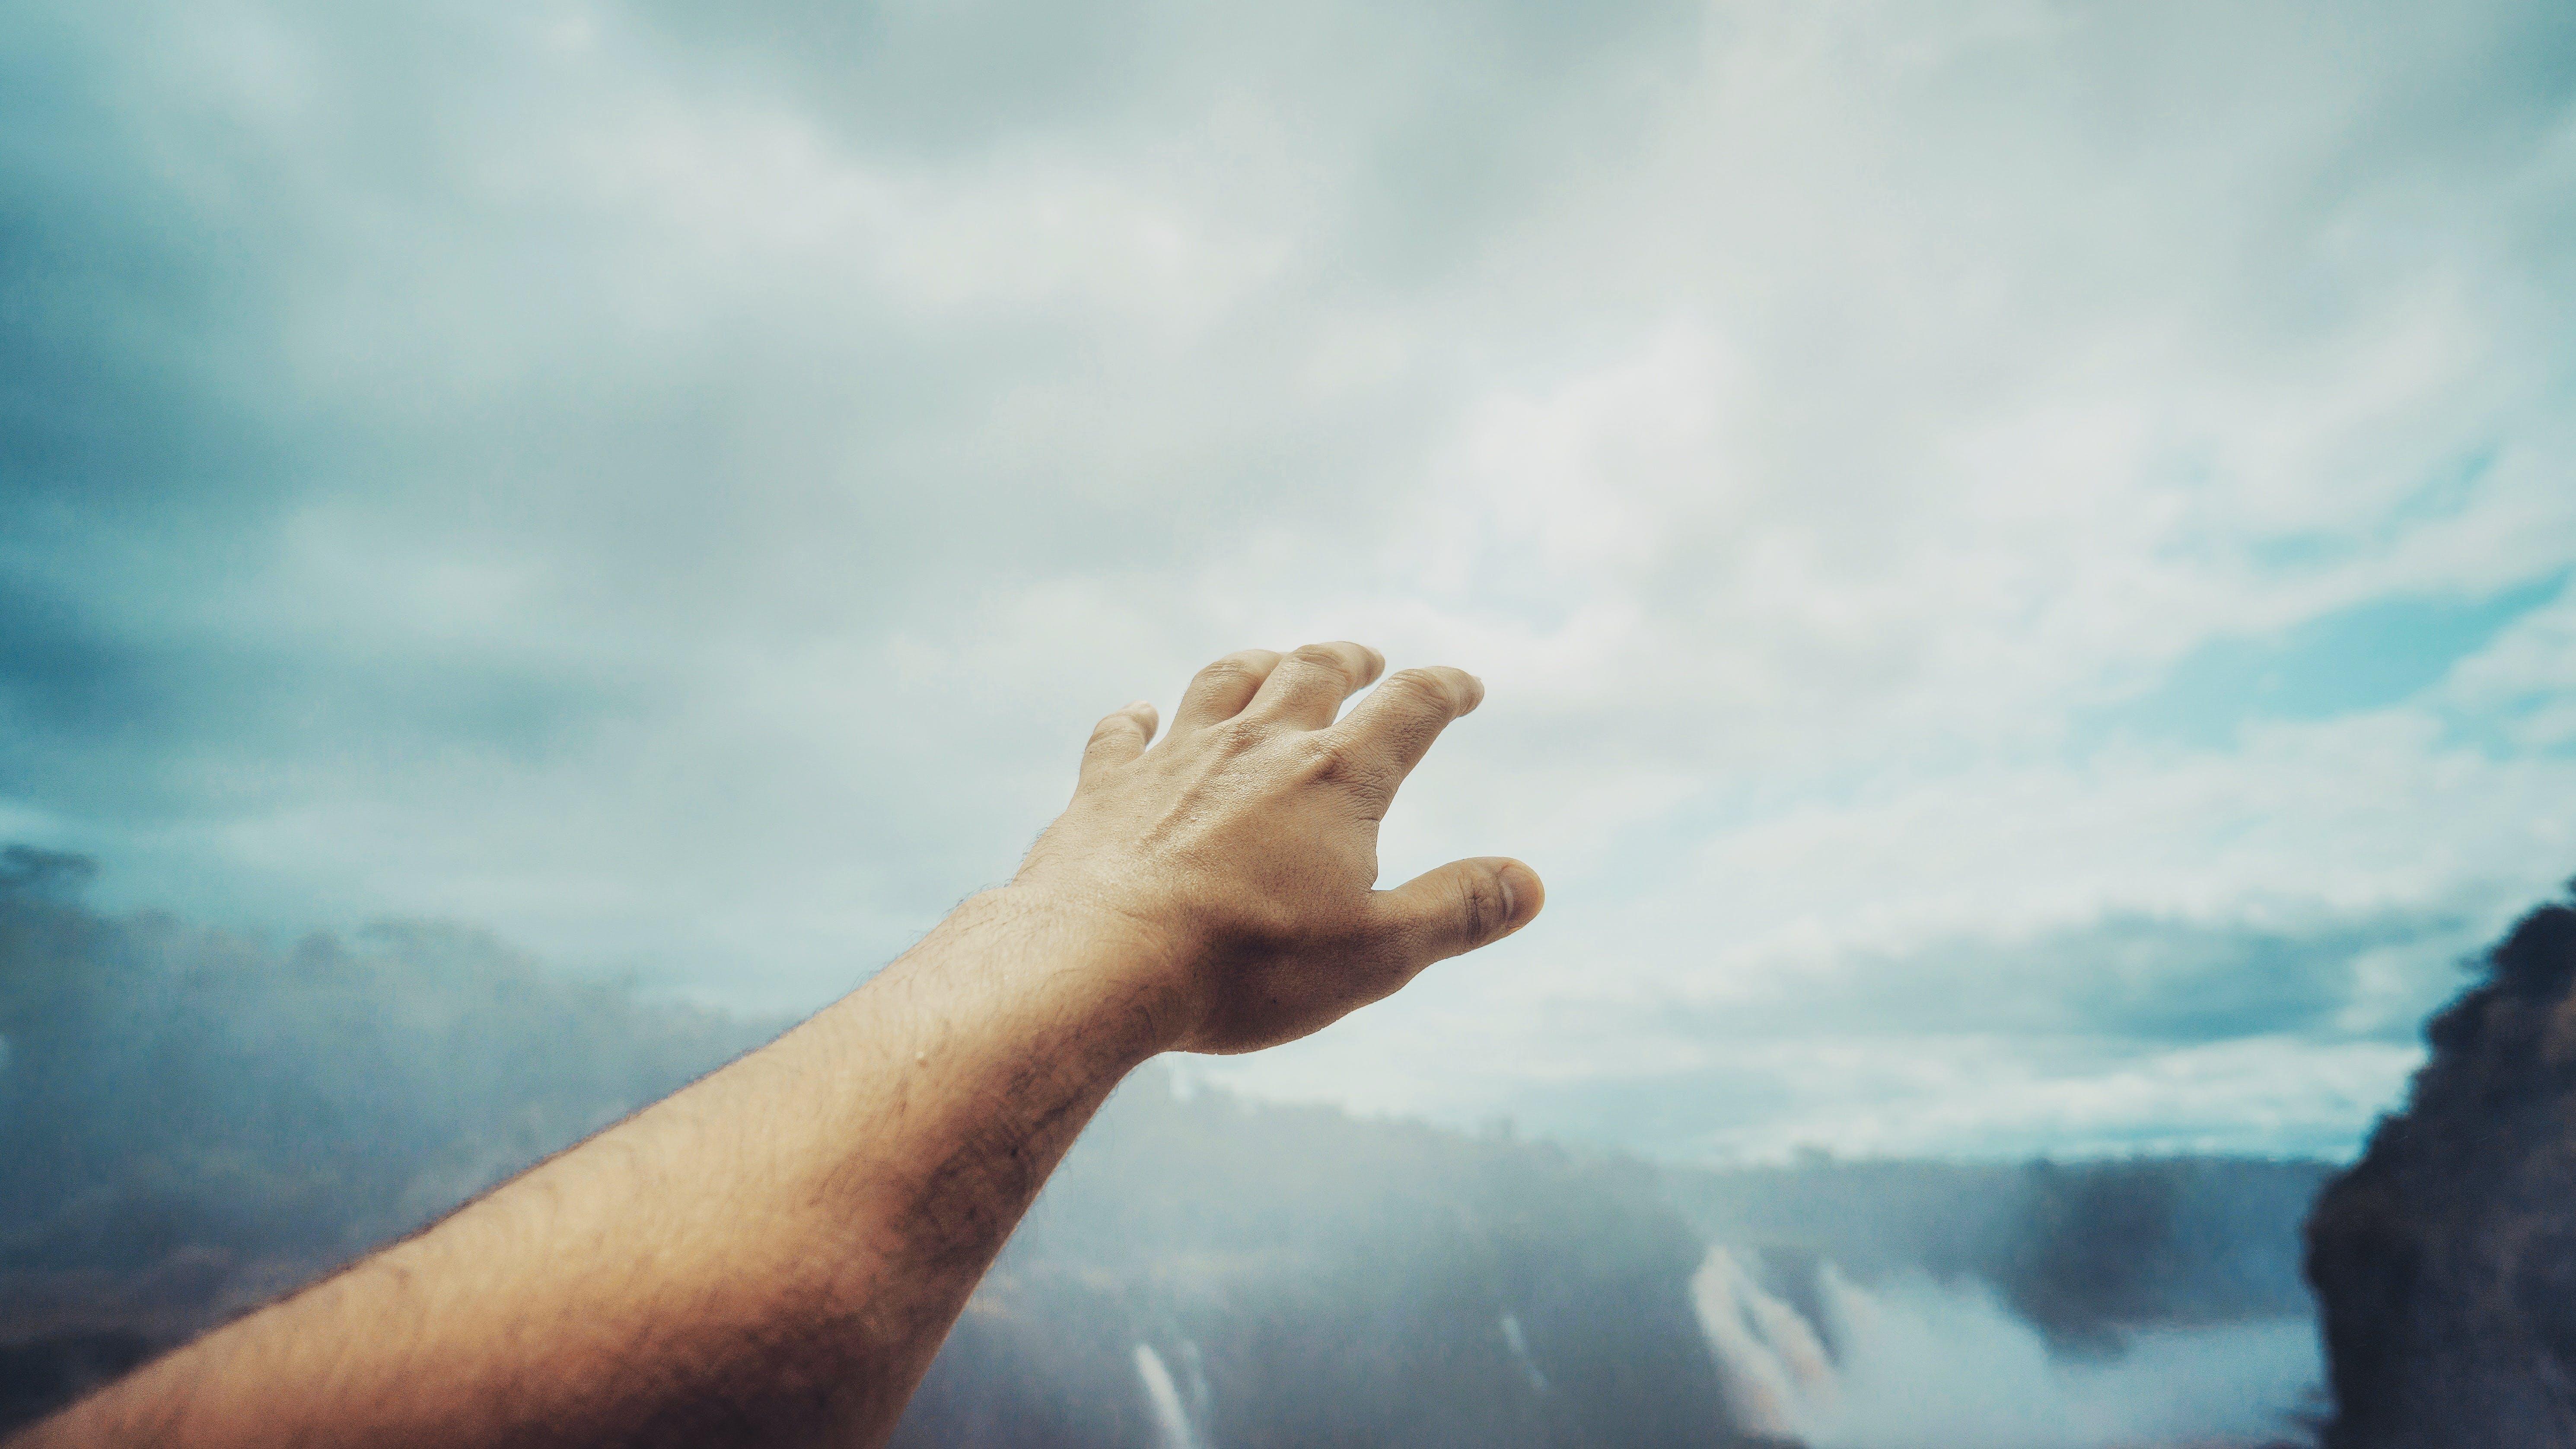 Person Raising His Hand